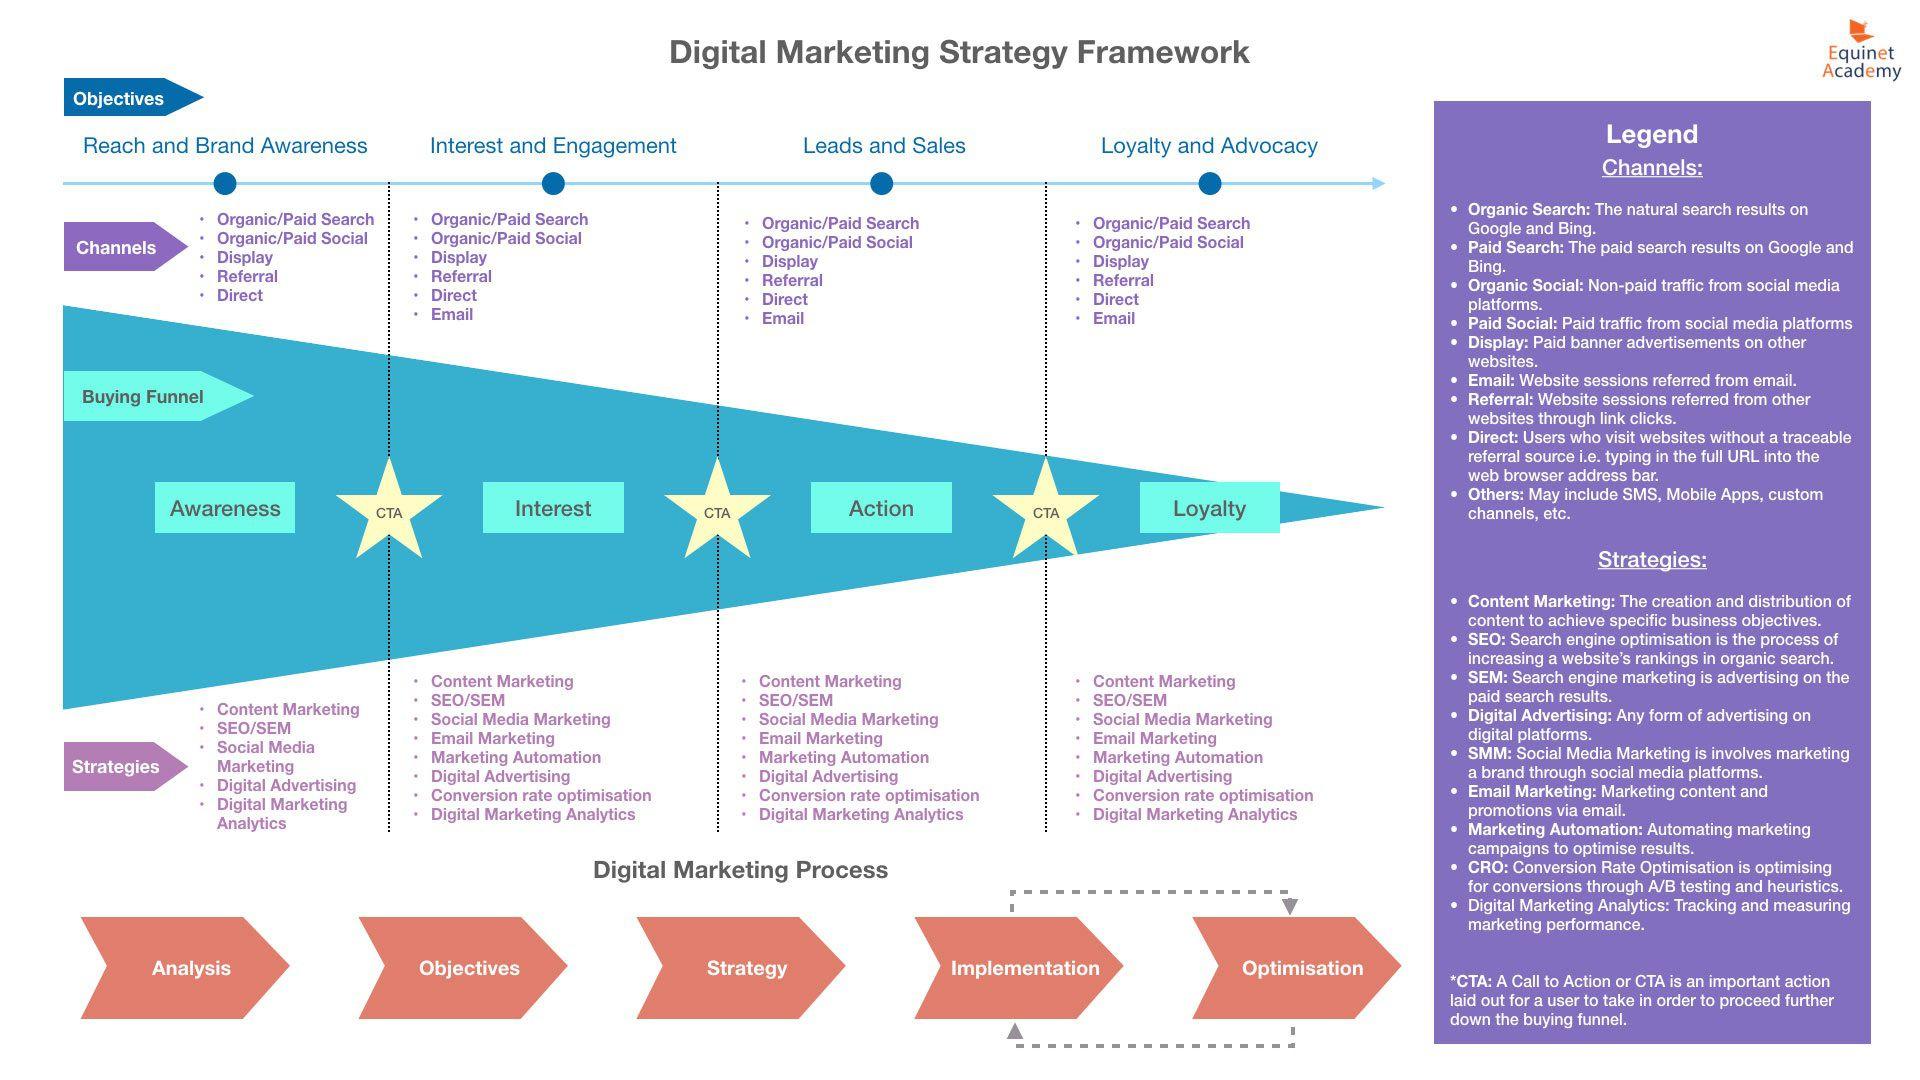 007 Breathtaking Digital Marketing Plan Example Pdf Sample  Free Template BusinesFull